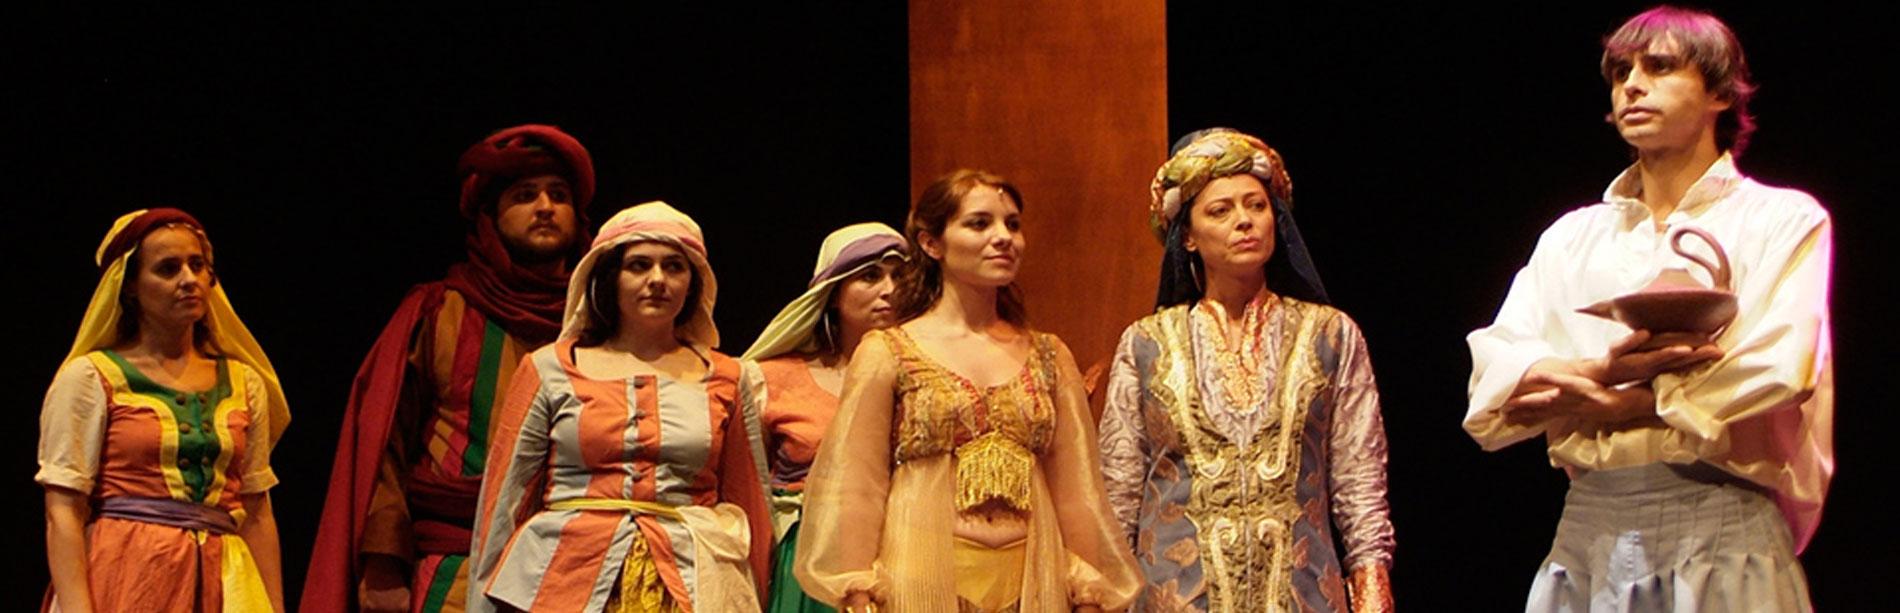 Teatro Escalante 19